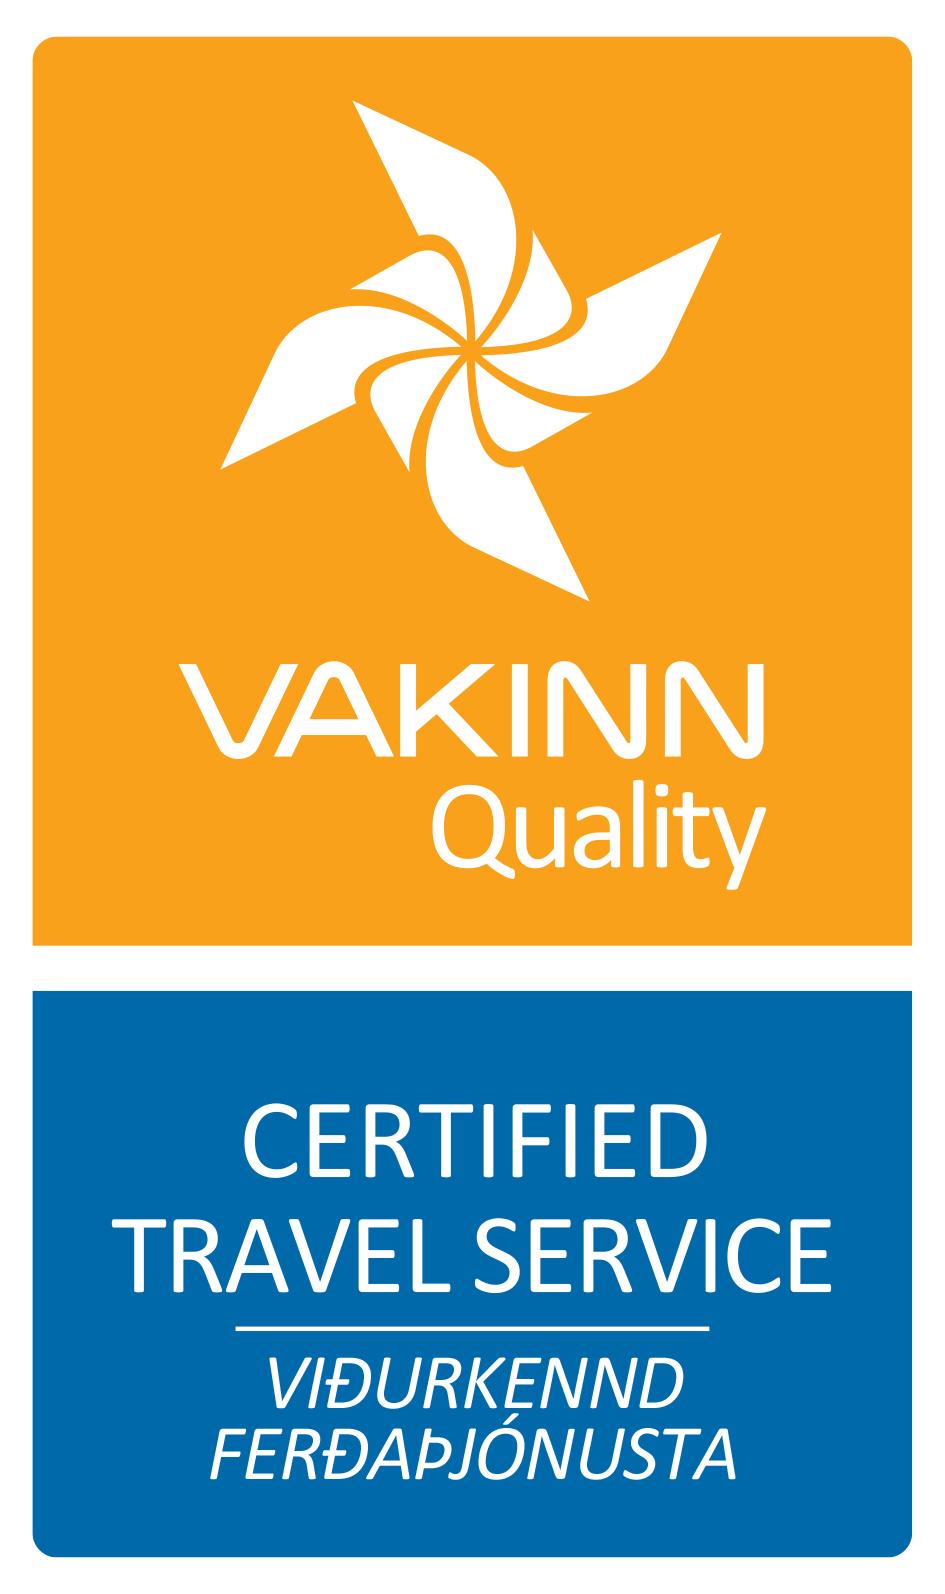 VAKINN_merki_Certified Travel Service.jpg